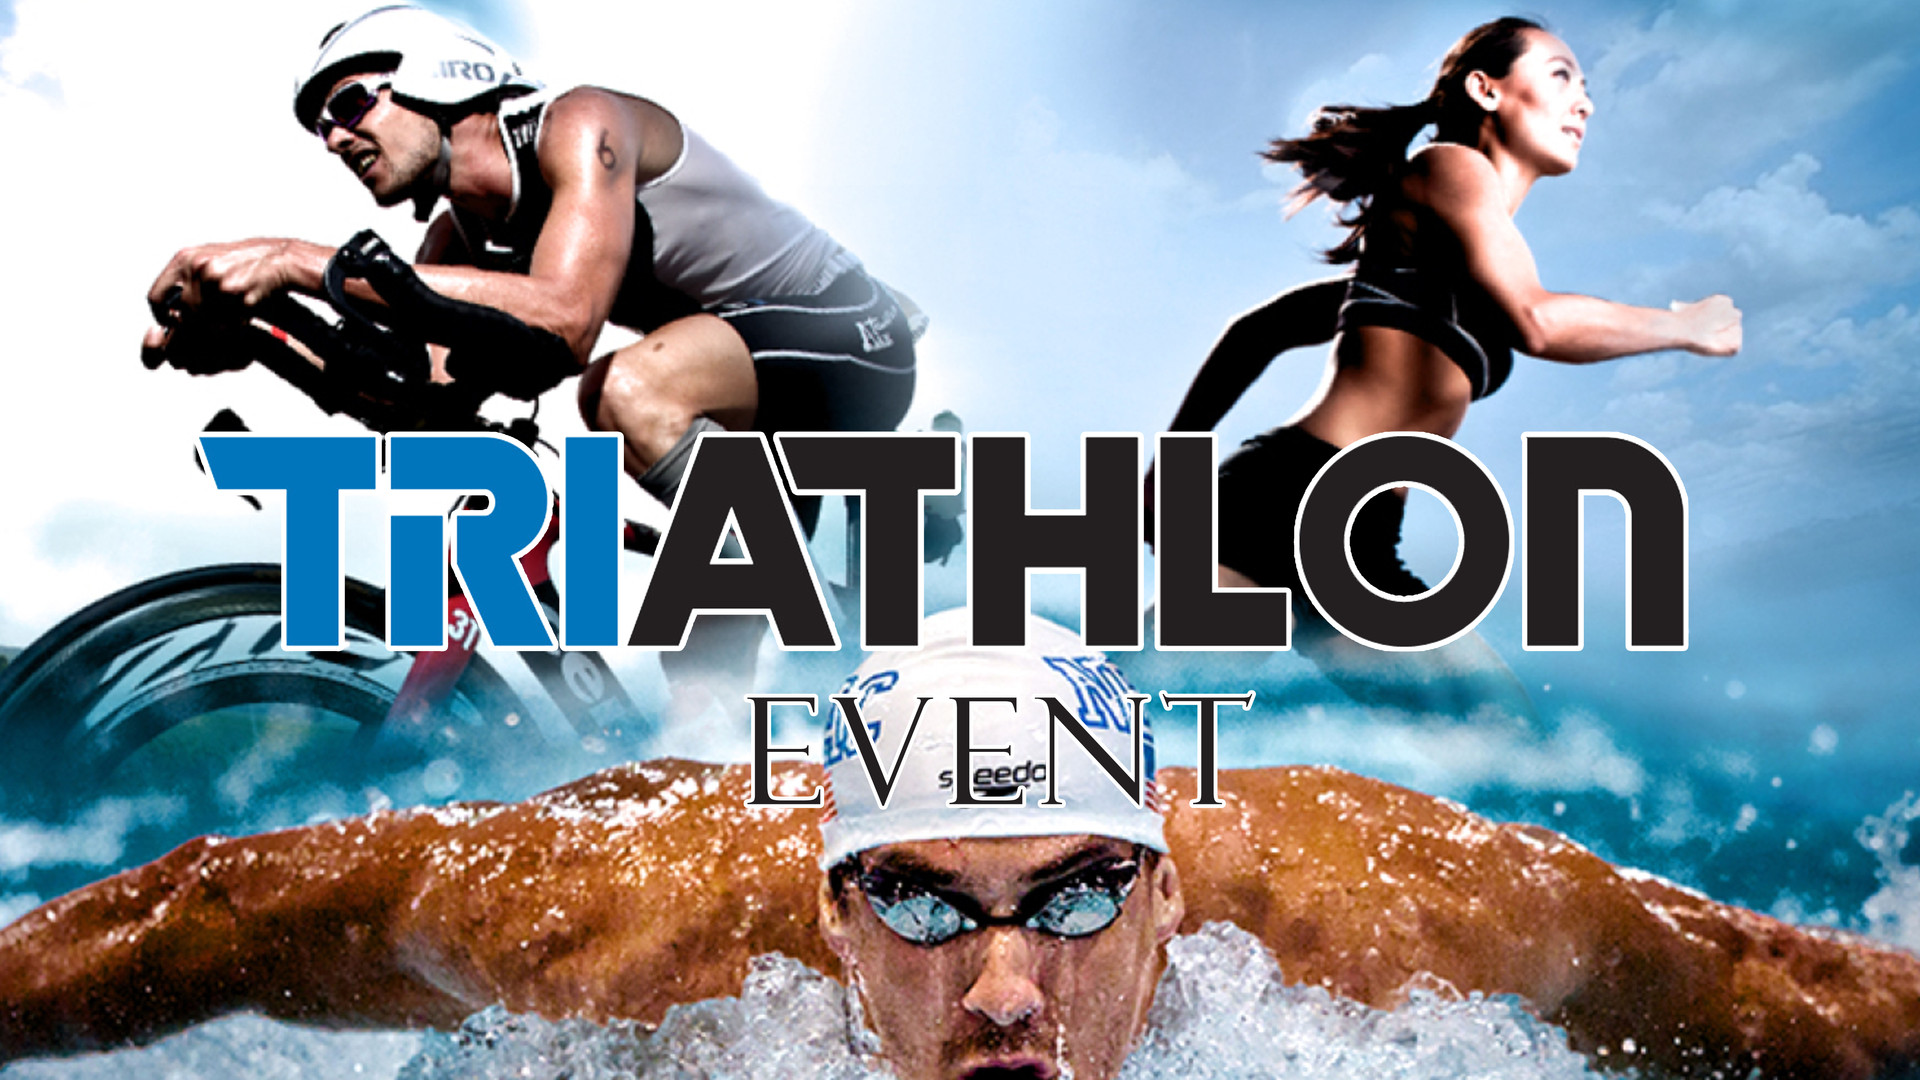 triathlon2 copy.jpg